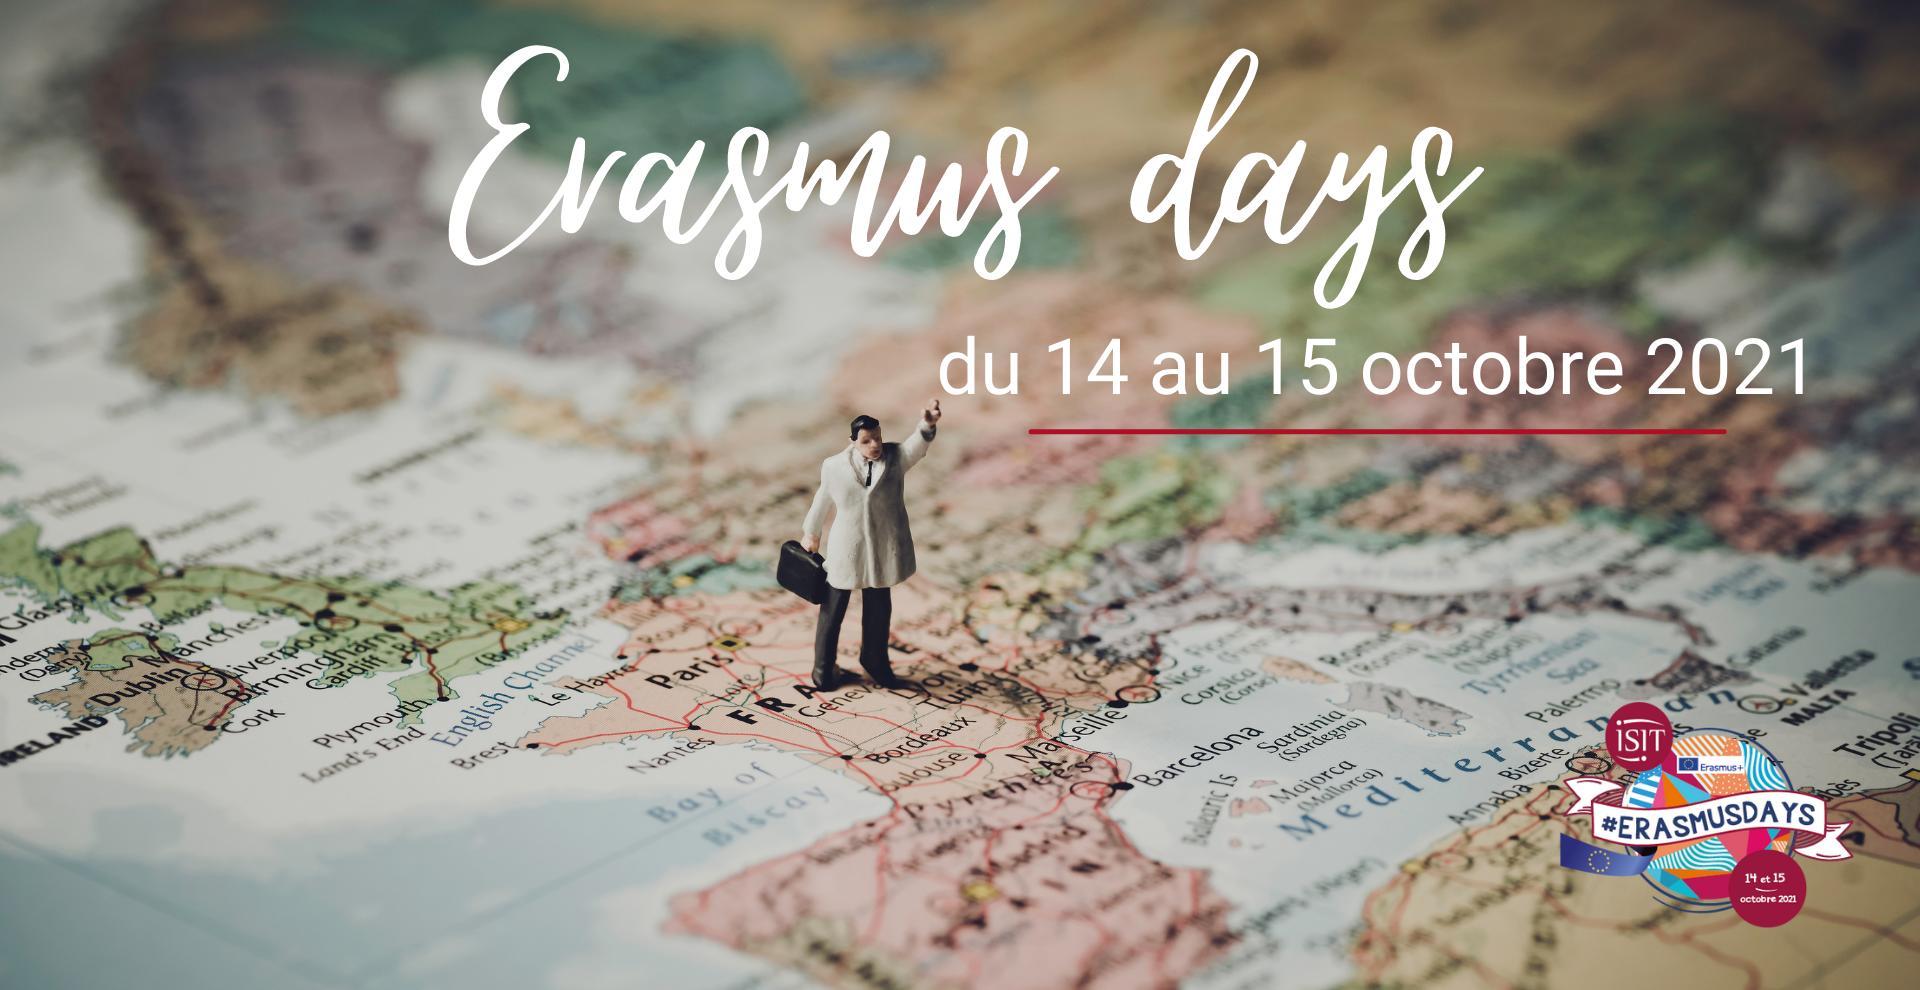 Erasmus Days by ISIT – 2nd edition